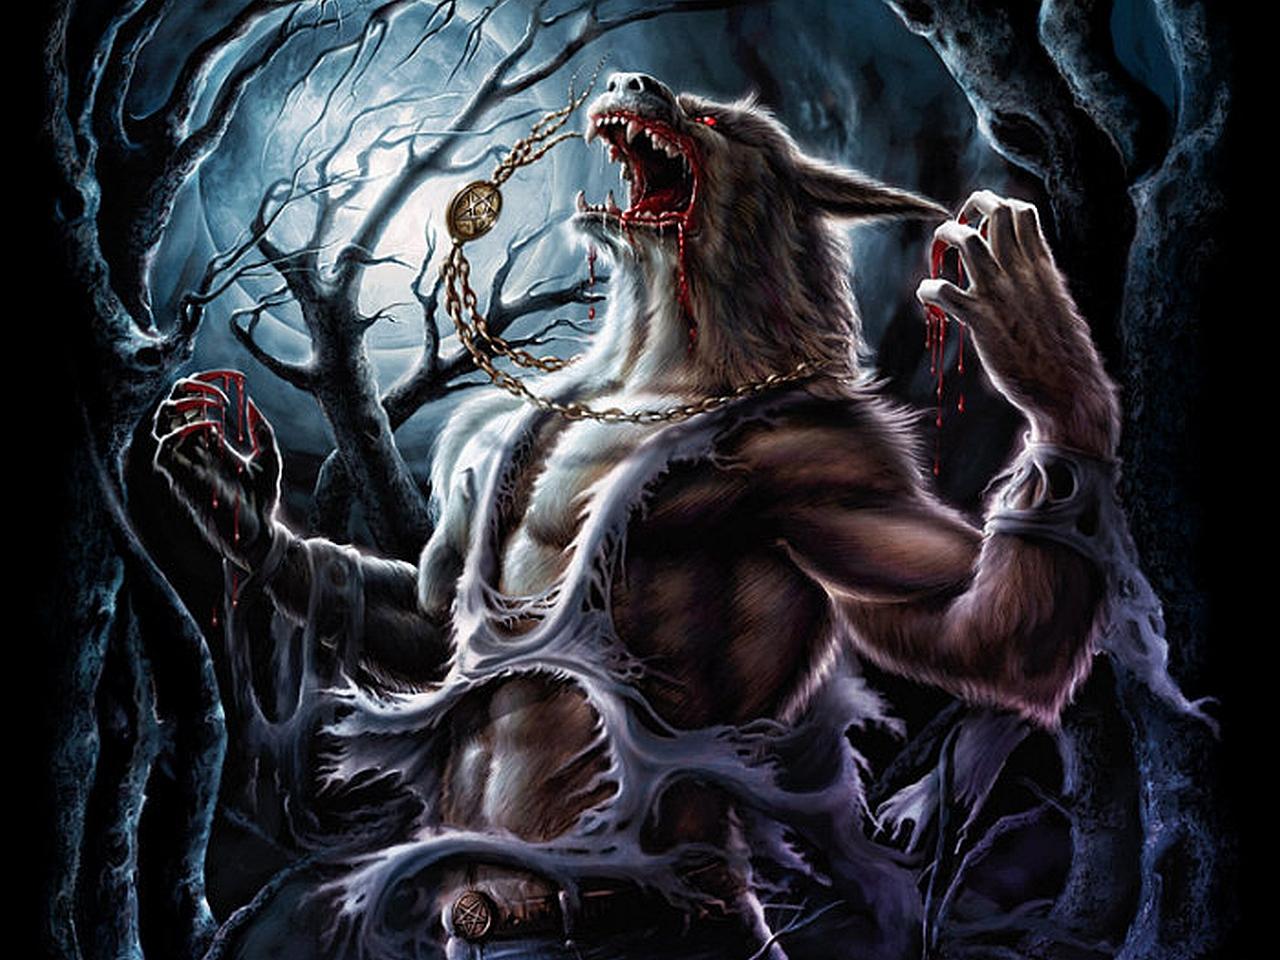 144 Werewolf Wallpapers Werewolf Backgrounds Page 2 1280x960